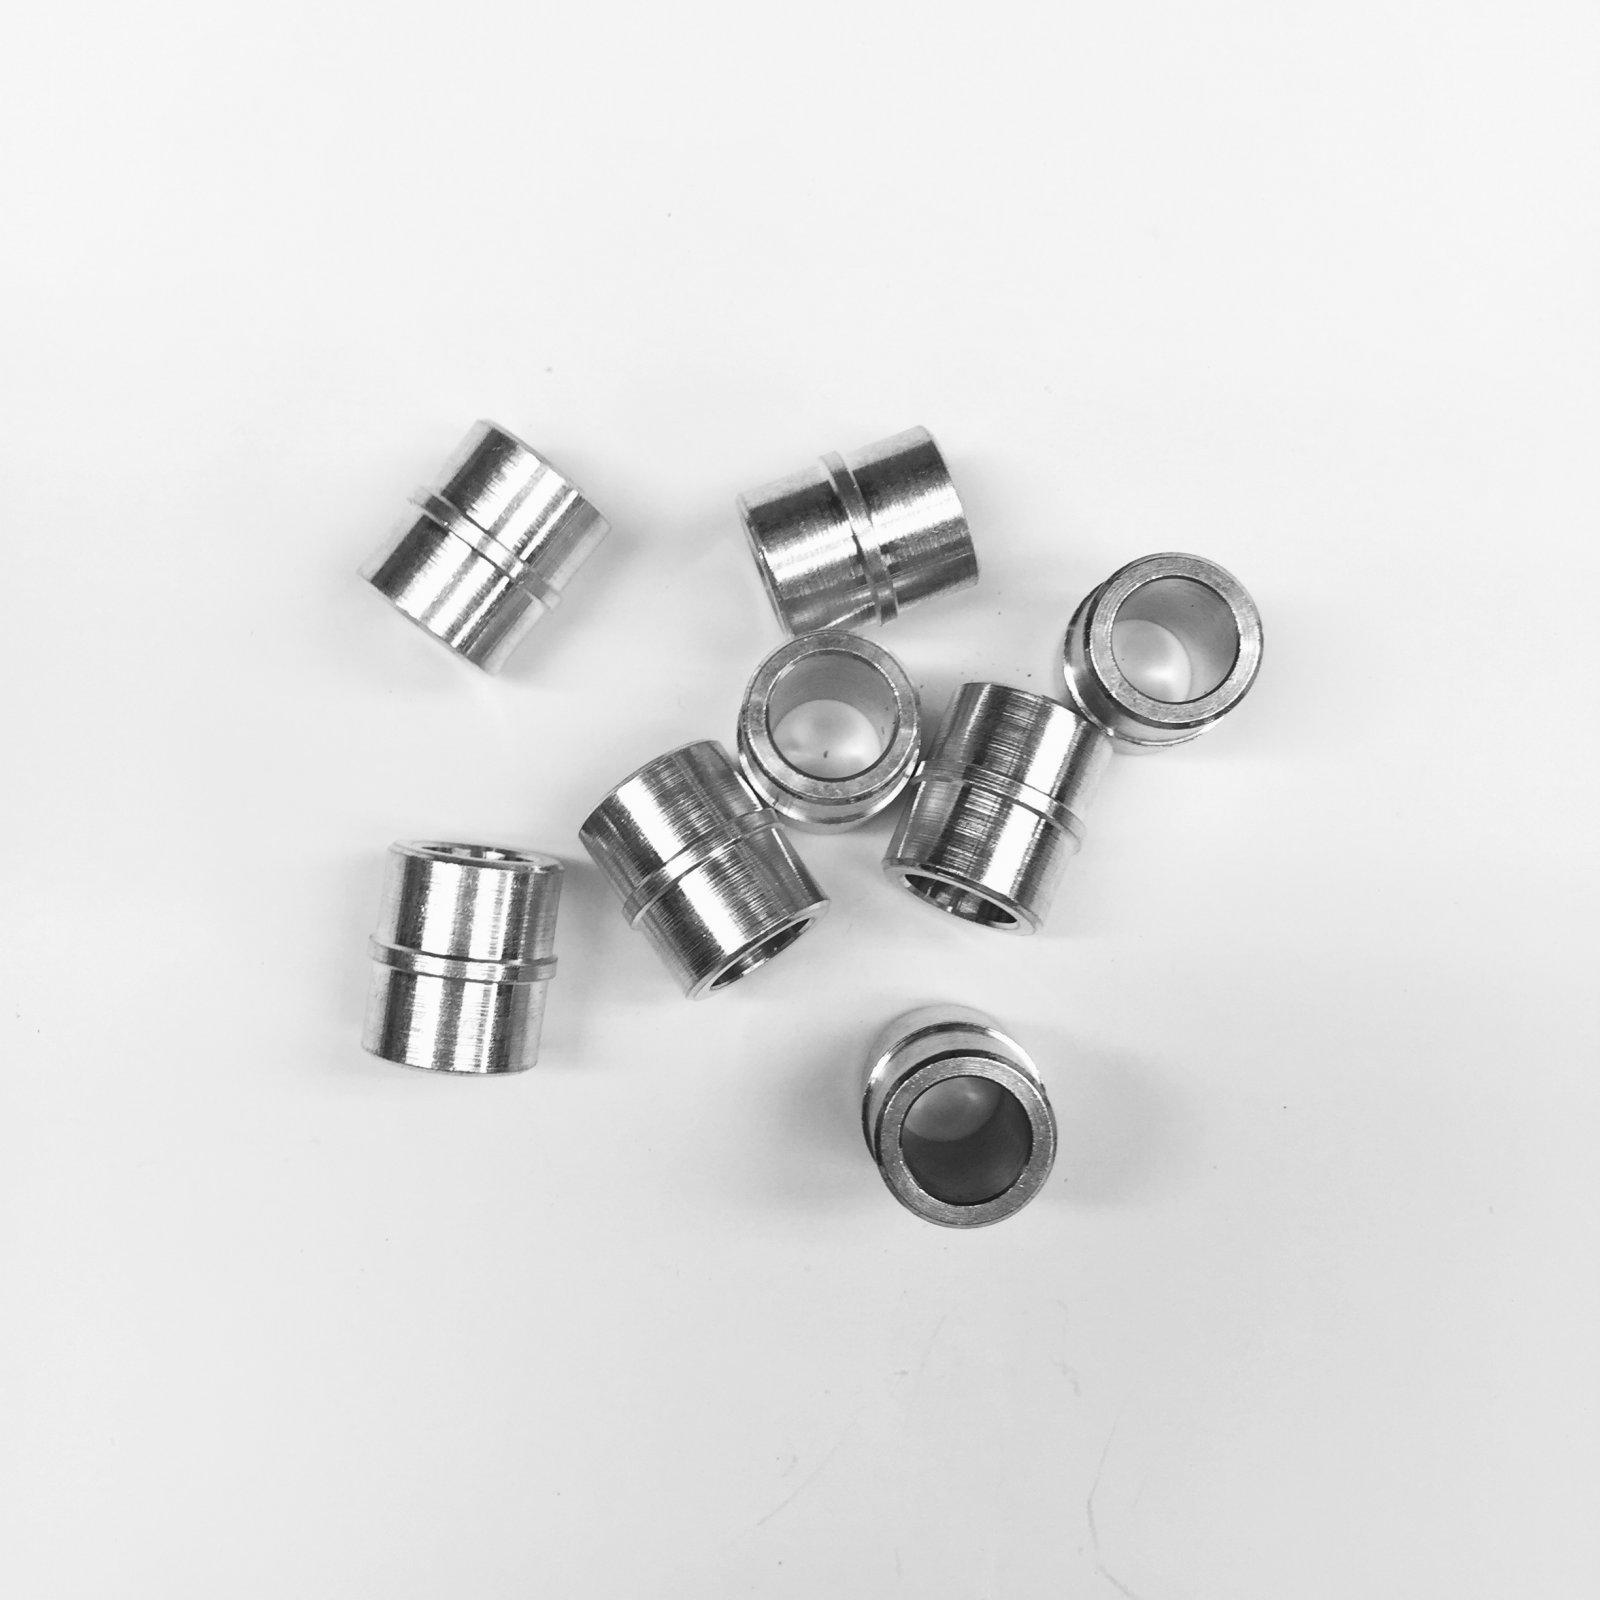 Rollerblade Aluminum Micro Bearing Spacers Kit